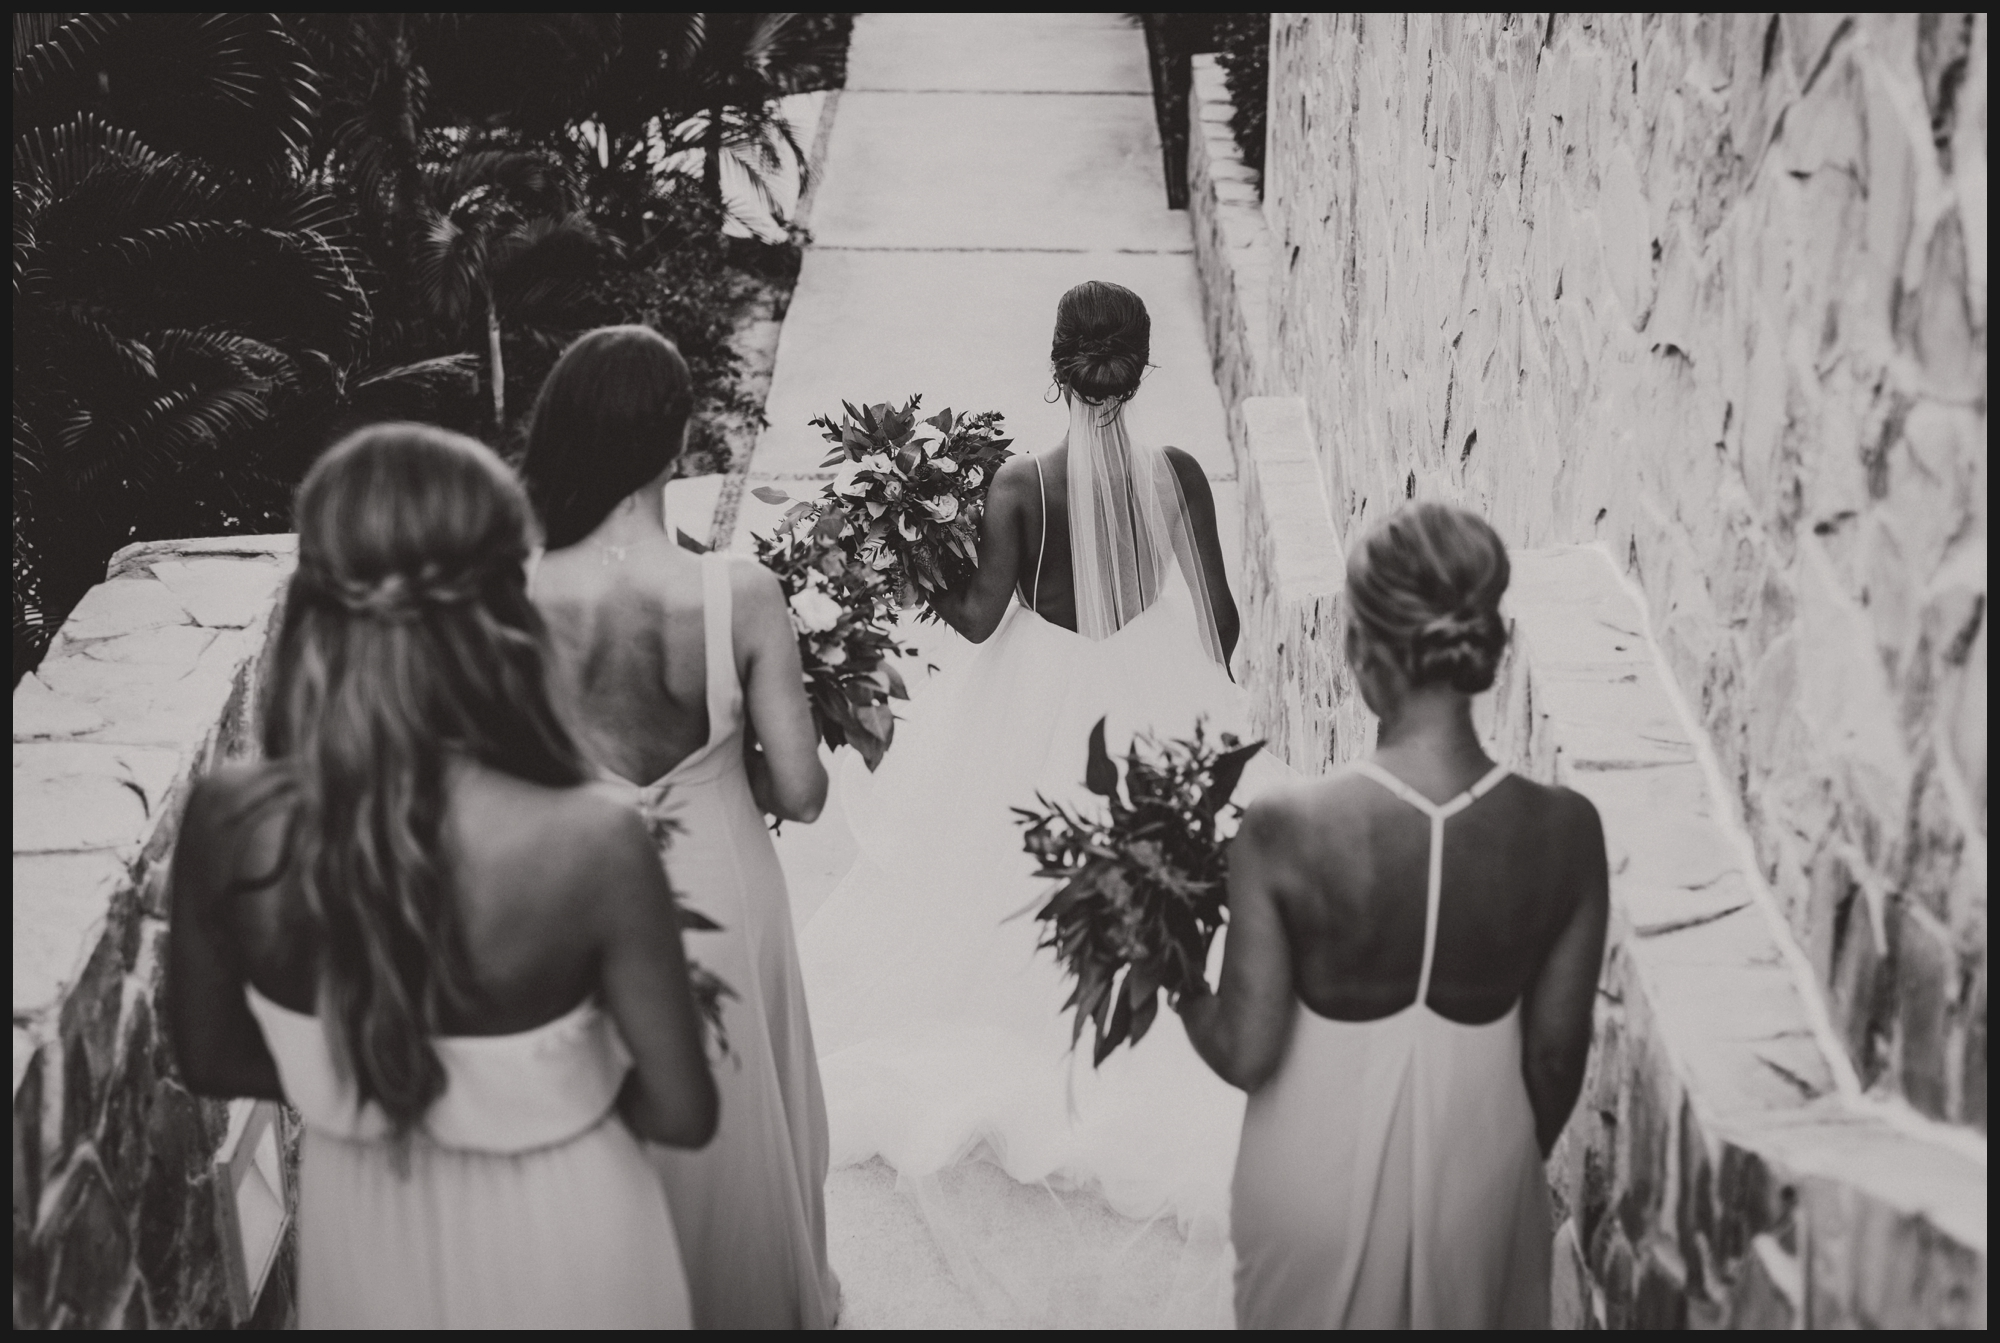 Orlando-Wedding-Photographer-destination-wedding-photographer-florida-wedding-photographer-bohemian-wedding-photographer_0512.jpg